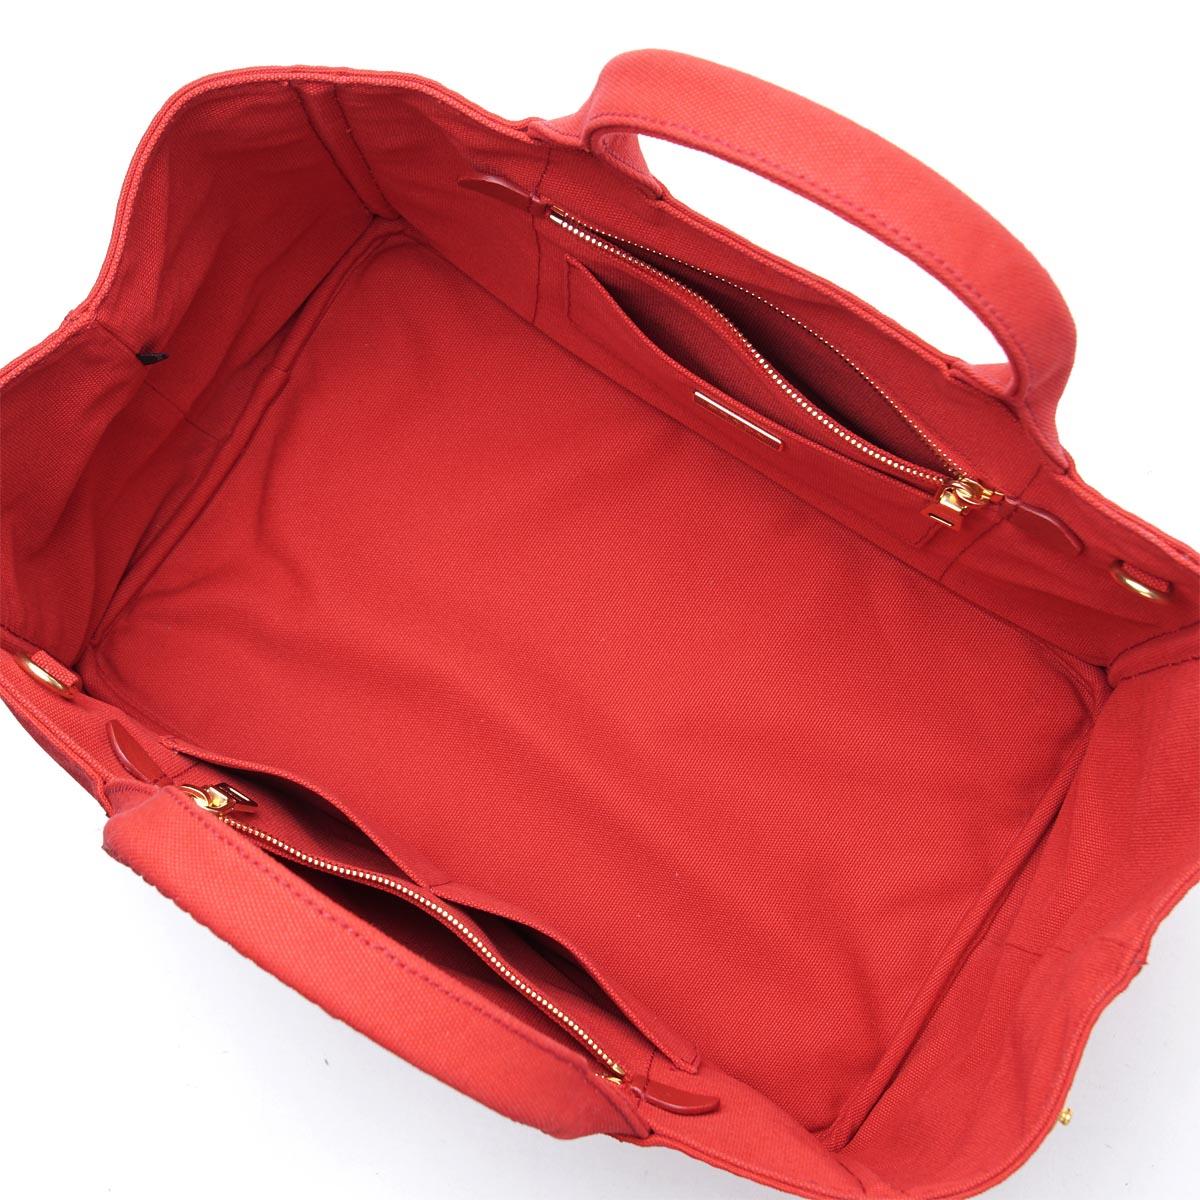 4670a1c6bf88 Modern Blue Rakuten Ichiba Shop: Prada PRADA handbag 2WAY red Lady's ...